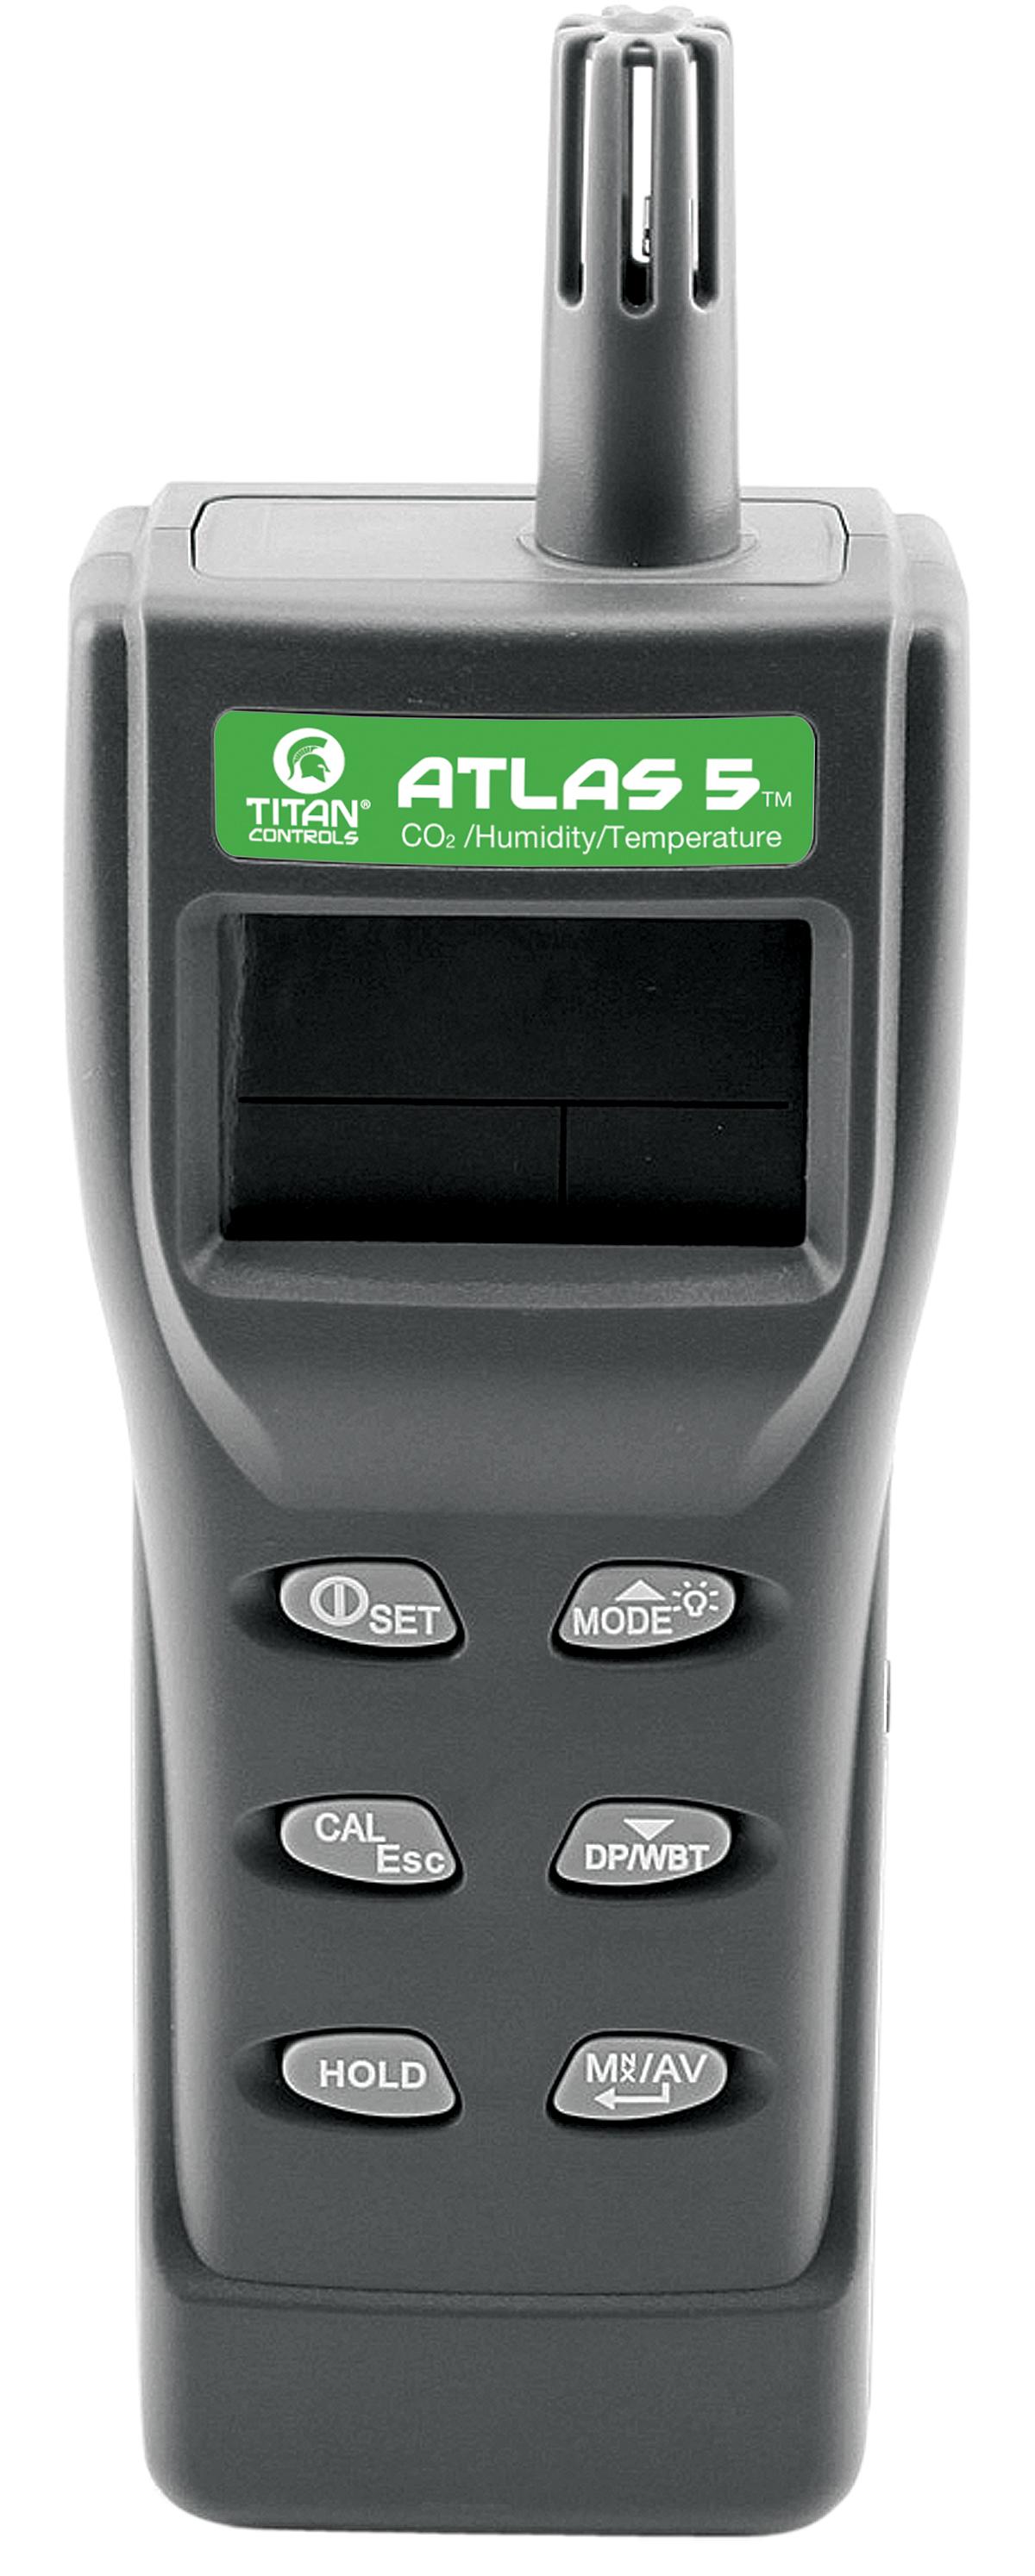 Titan Controls Atlas 5 - Portable Handheld CO2 Temperature/Humidity Monitor